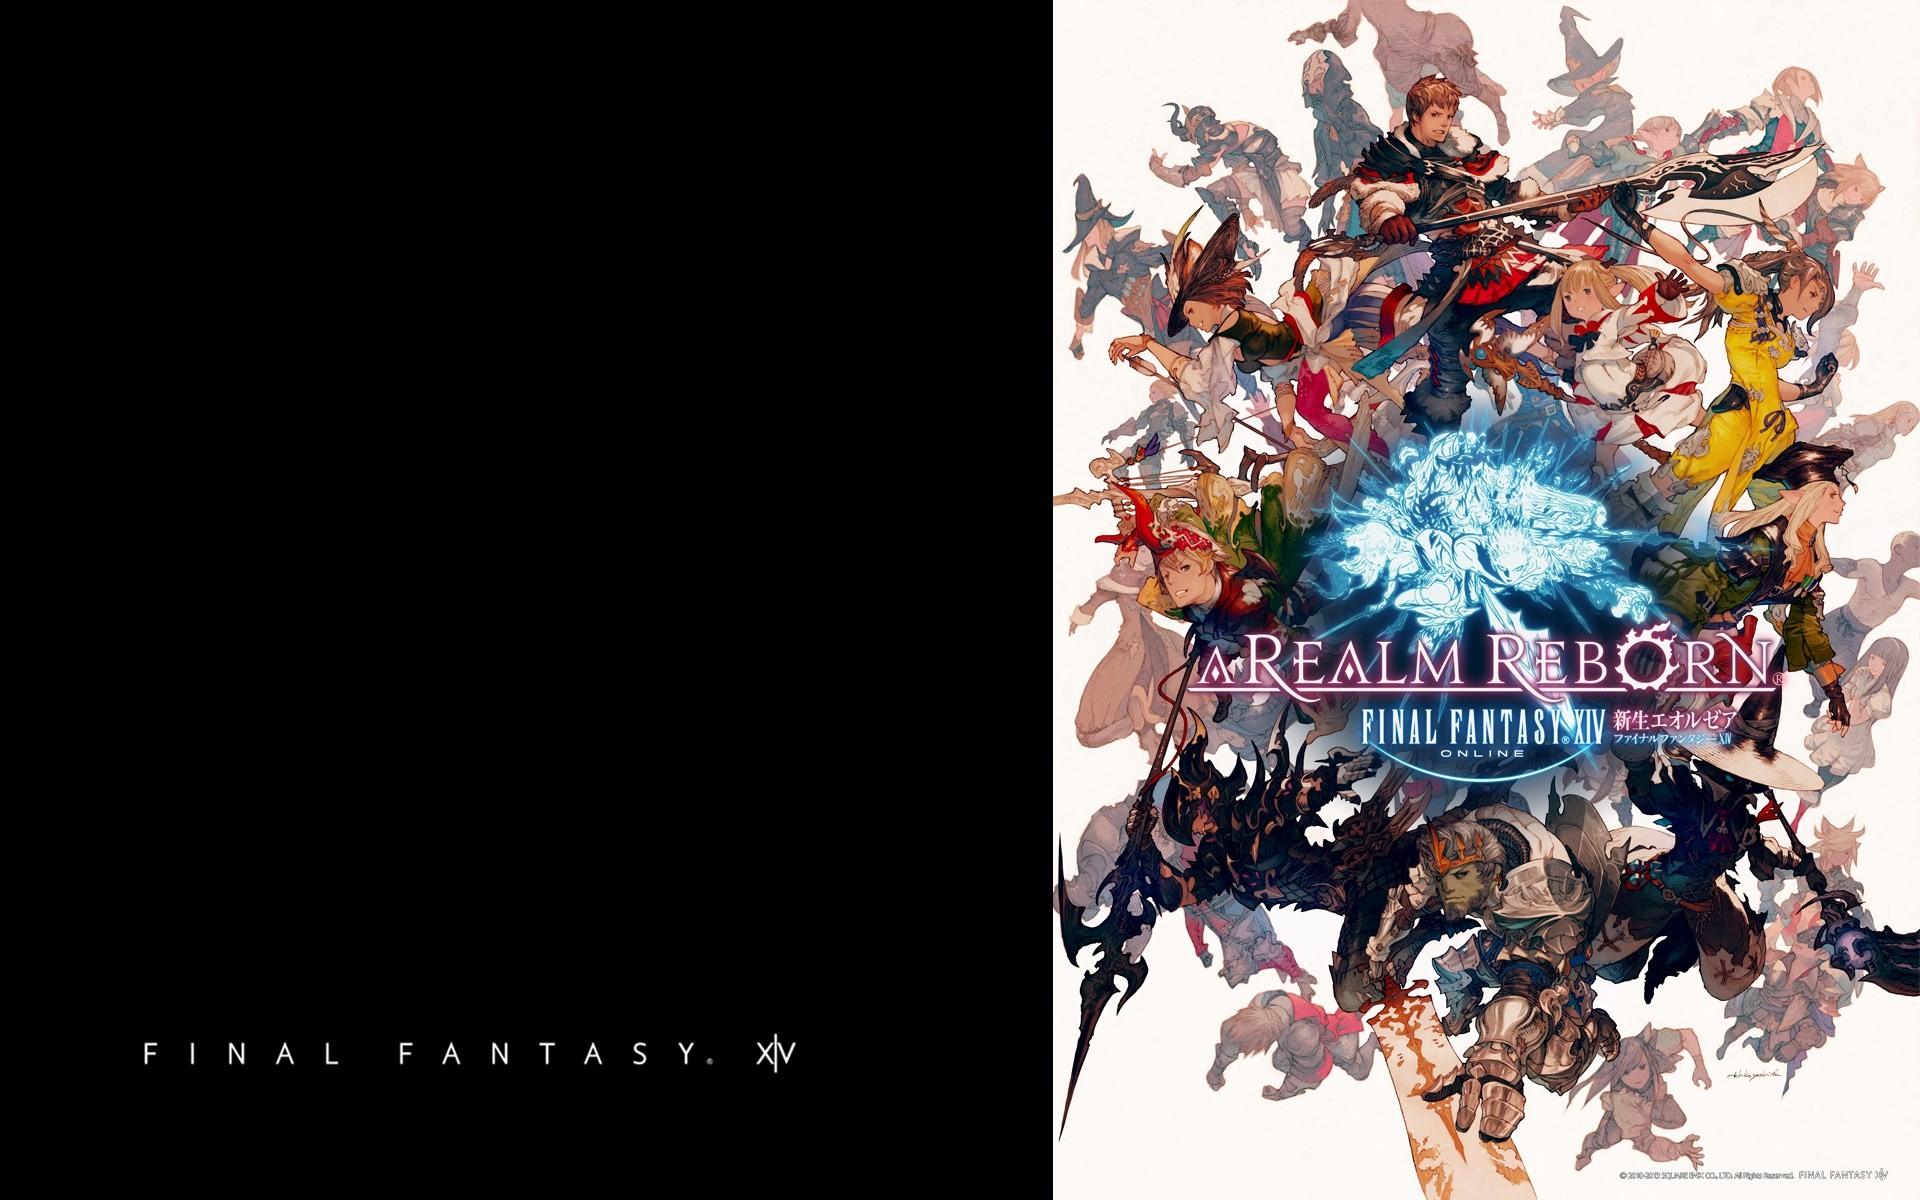 Amazing final fantasy xv